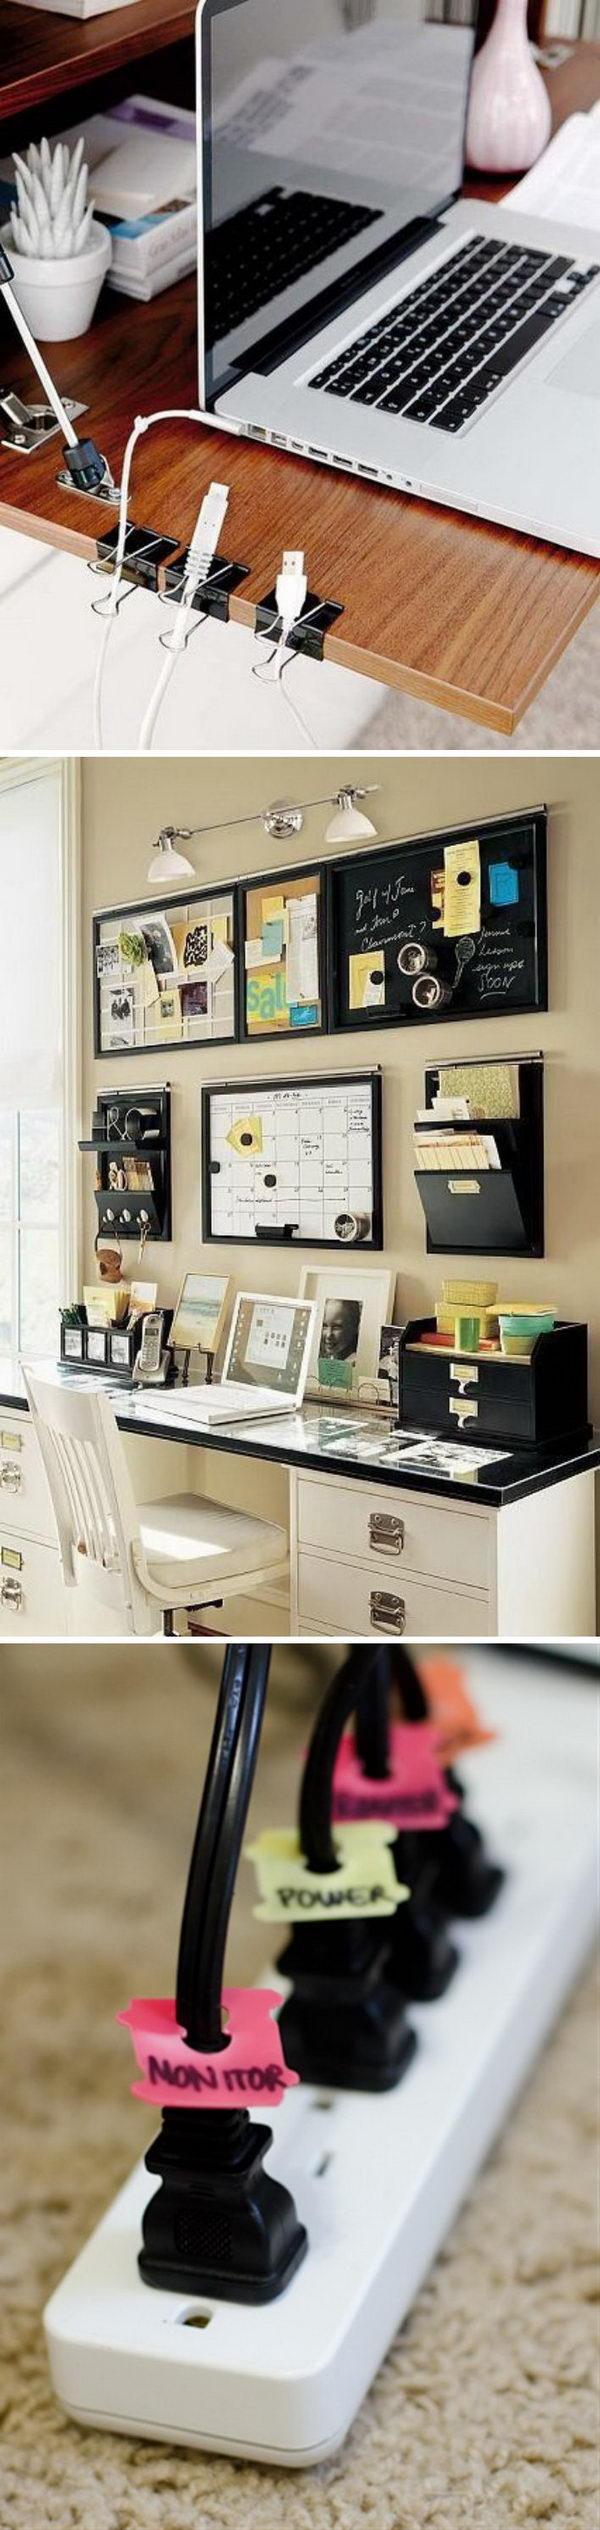 office diy ideas. Effective Home Office Organization Ideas. Diy Ideas N